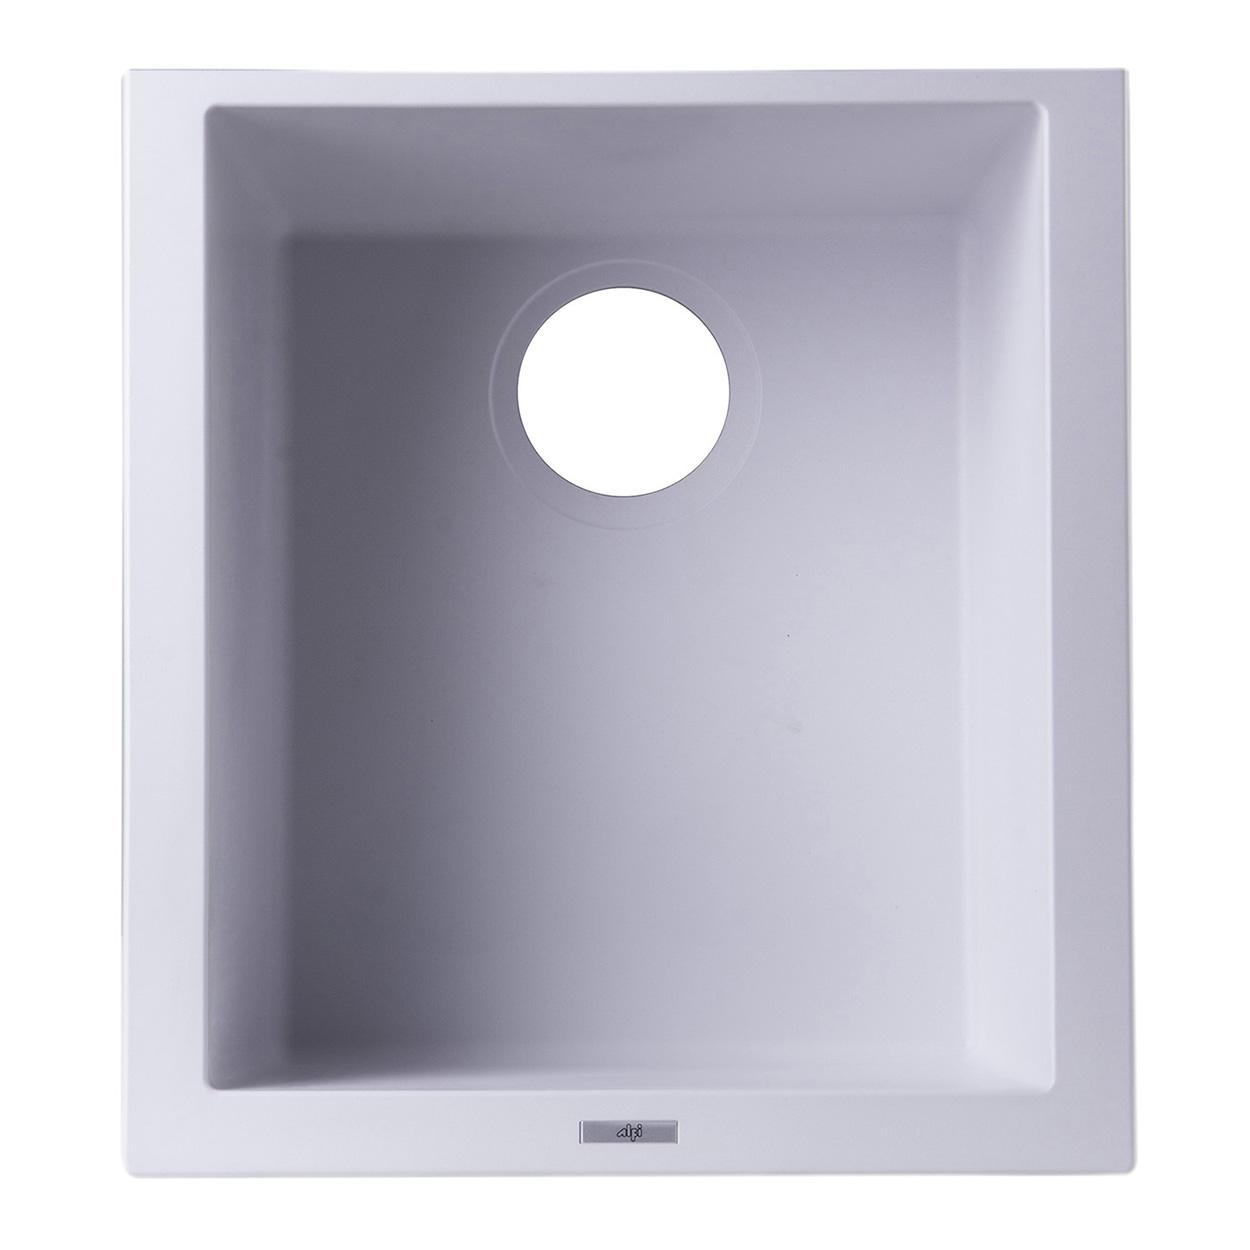 "ALFI Brand AB1720UM-W White 17"" Undermount Rectangular Granite Composite Kitchen Prep Sink - Image 1"